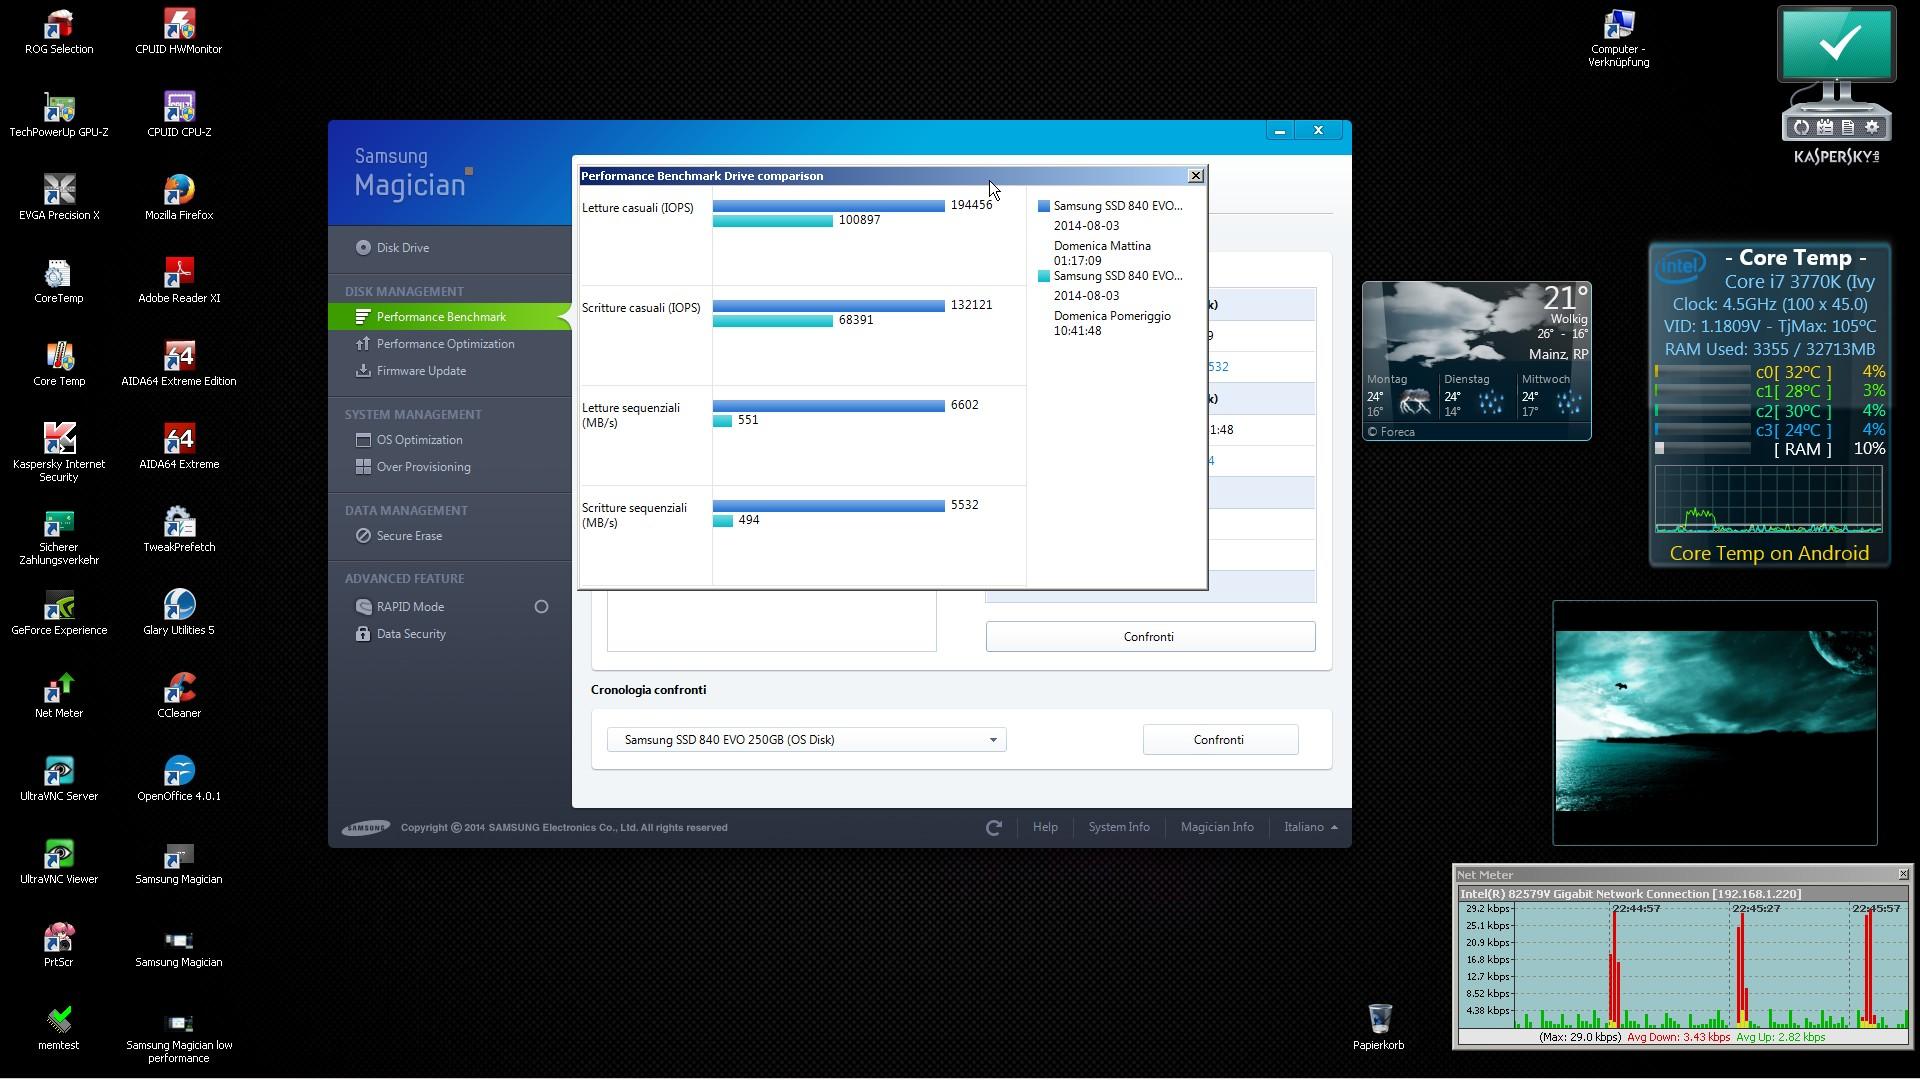 Performance Benchmark Drive comparison benchmark.jpg